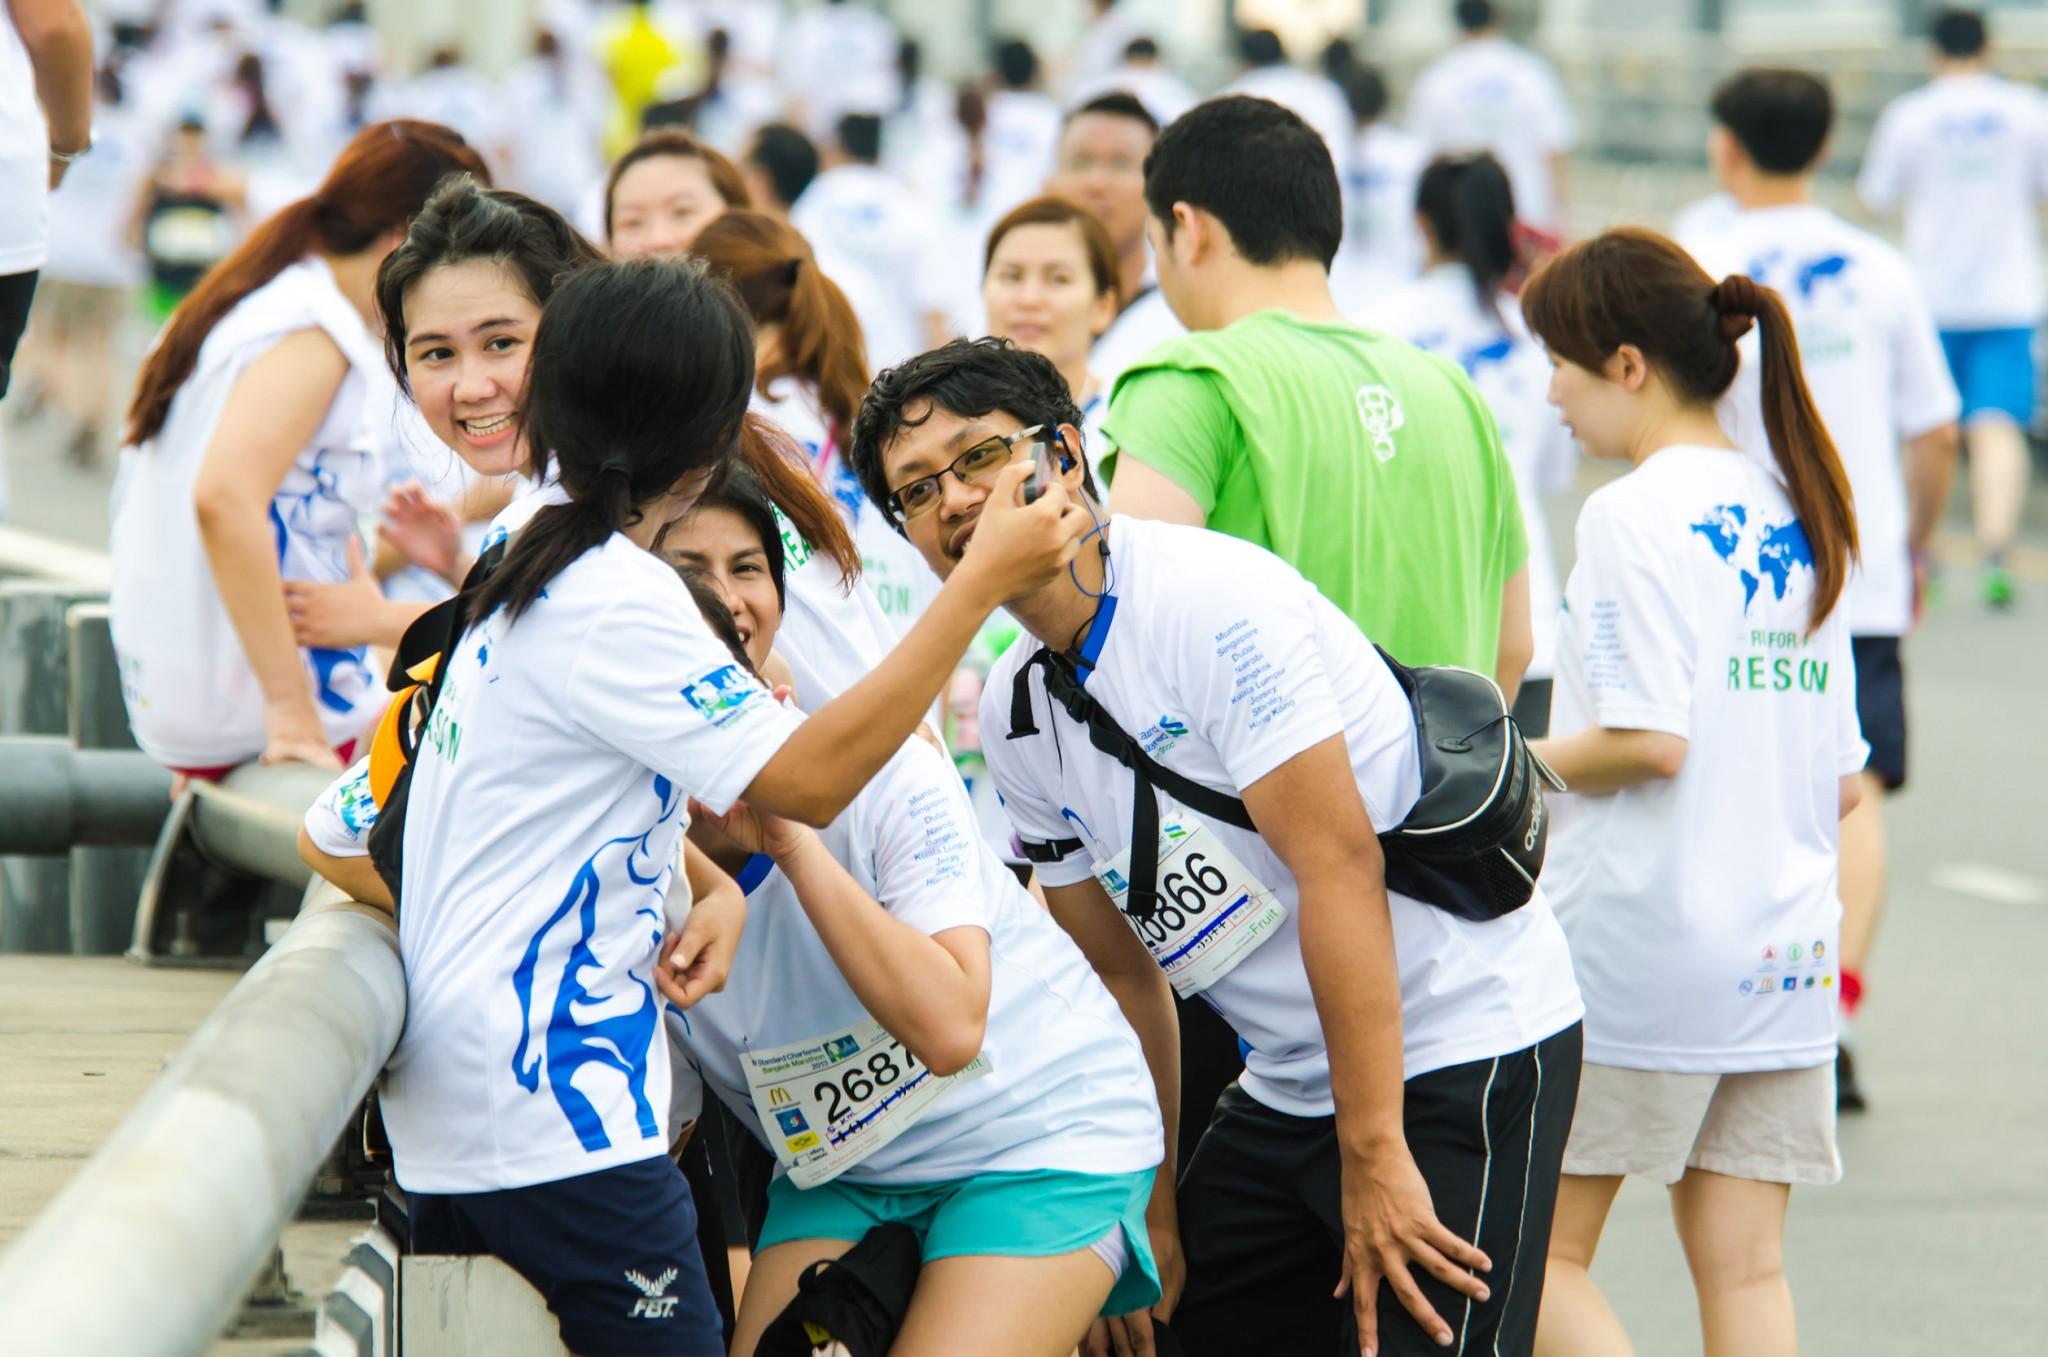 selfie-at-marathon-race